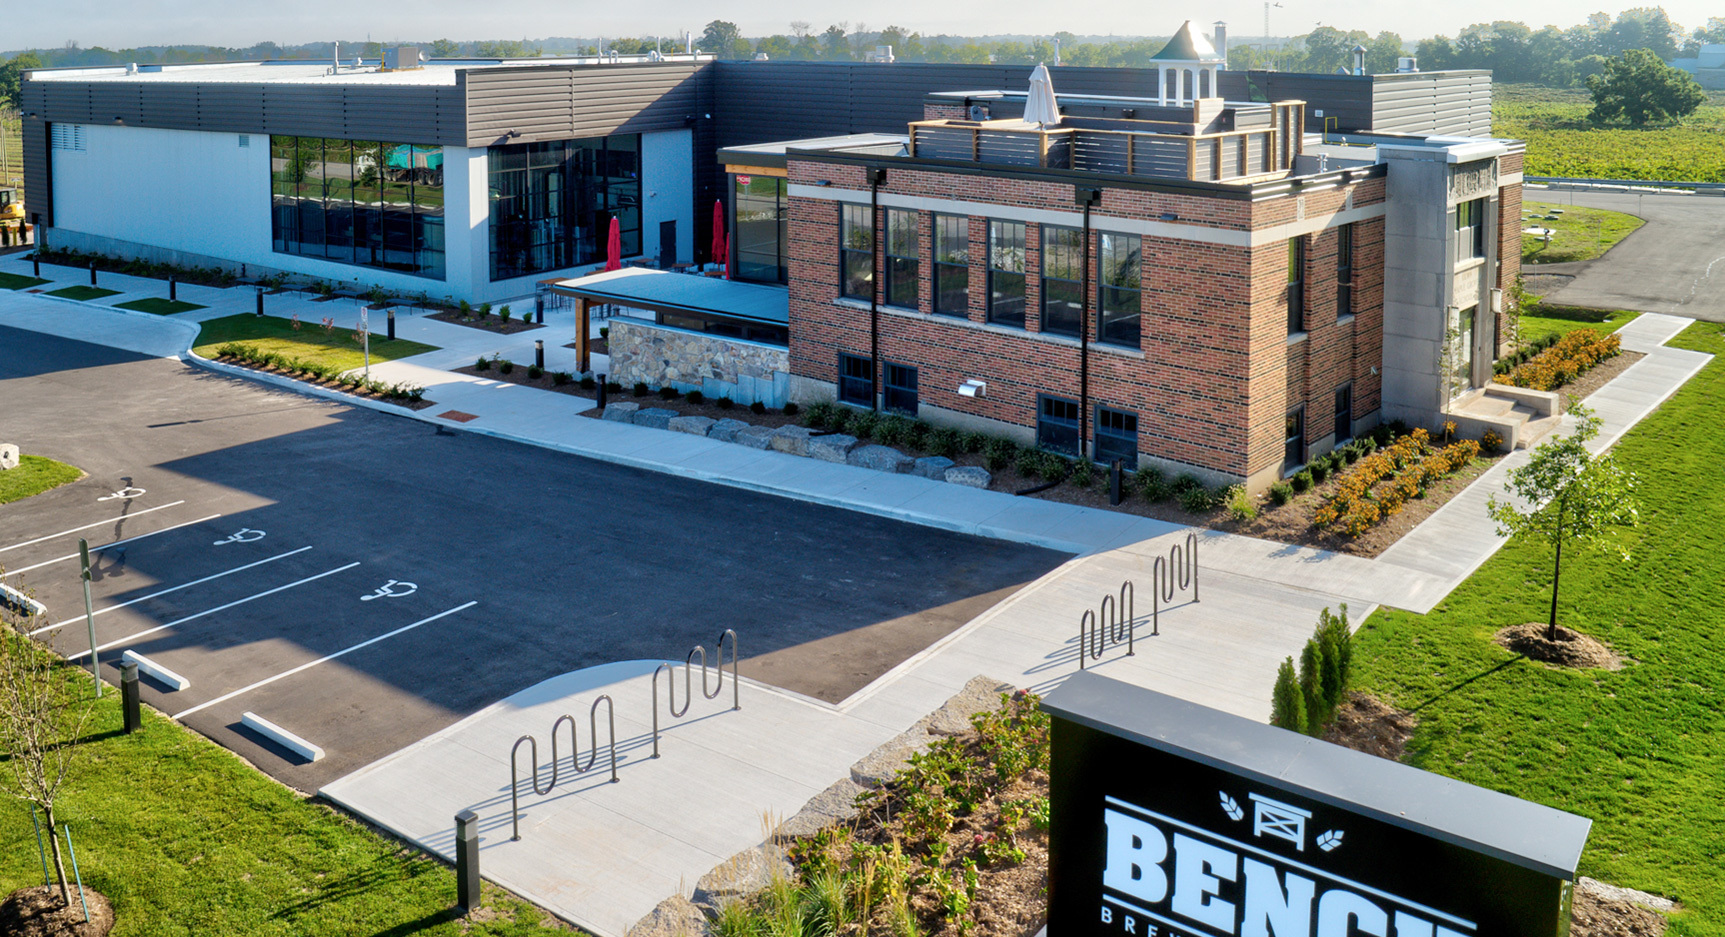 Bench Brewery Commercial Raimondo Associates Architects Inc